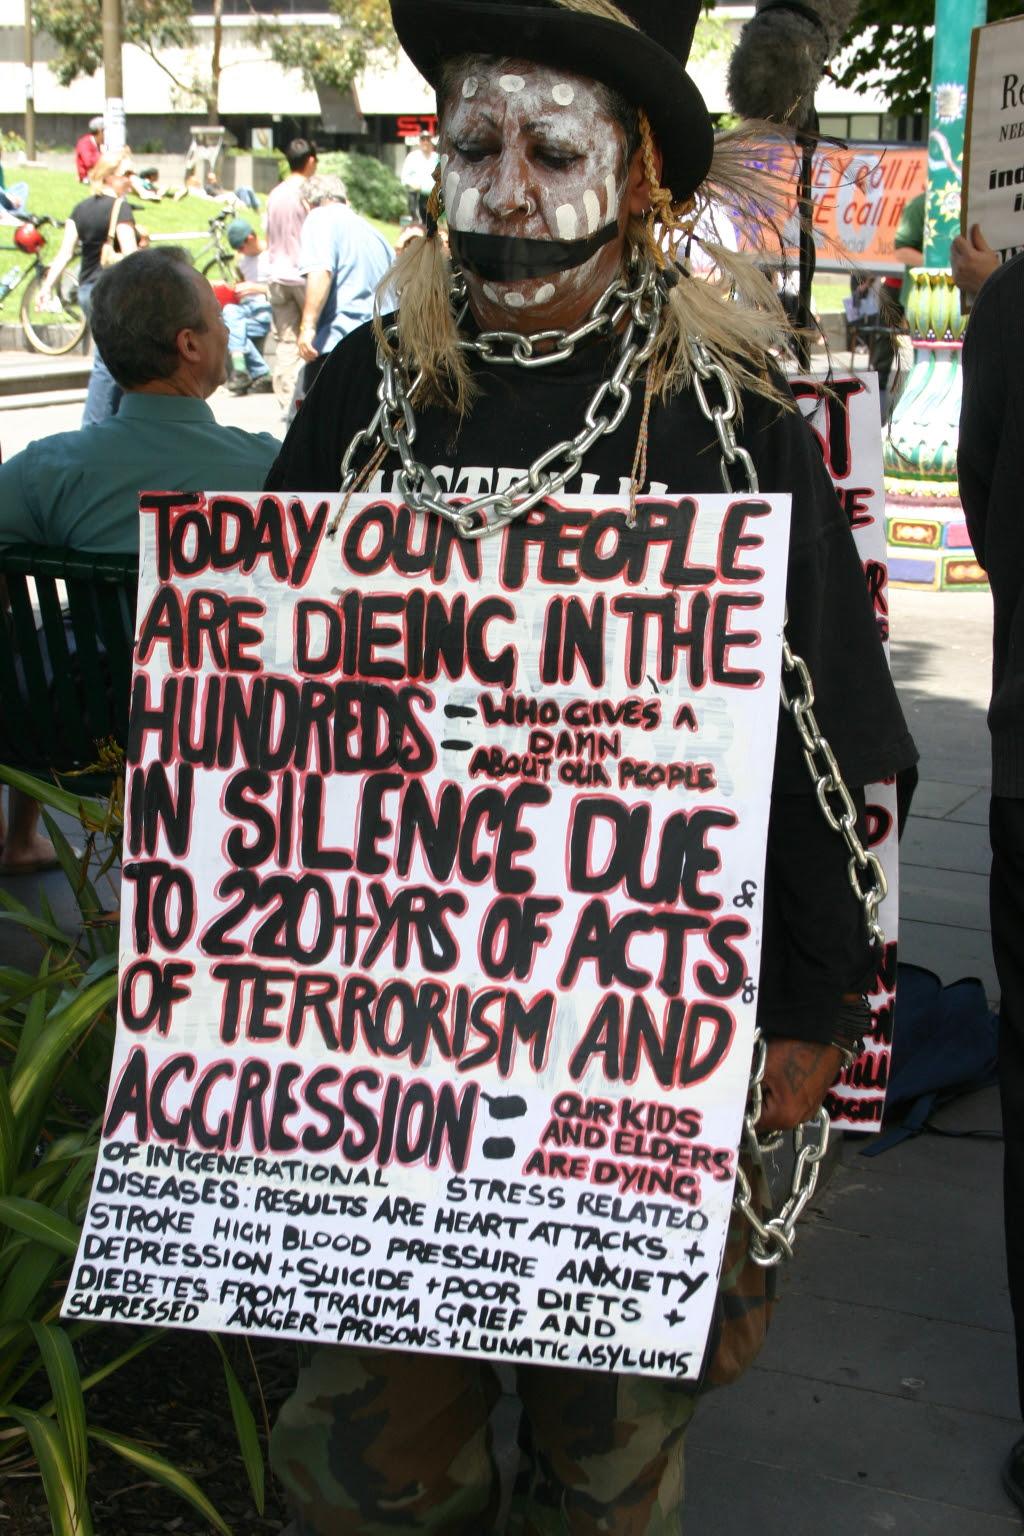 http://upload.wikimedia.org/wikipedia/commons/8/80/Susan_Charles_Rankin_on_Human_Rights_Day_2005.jpg